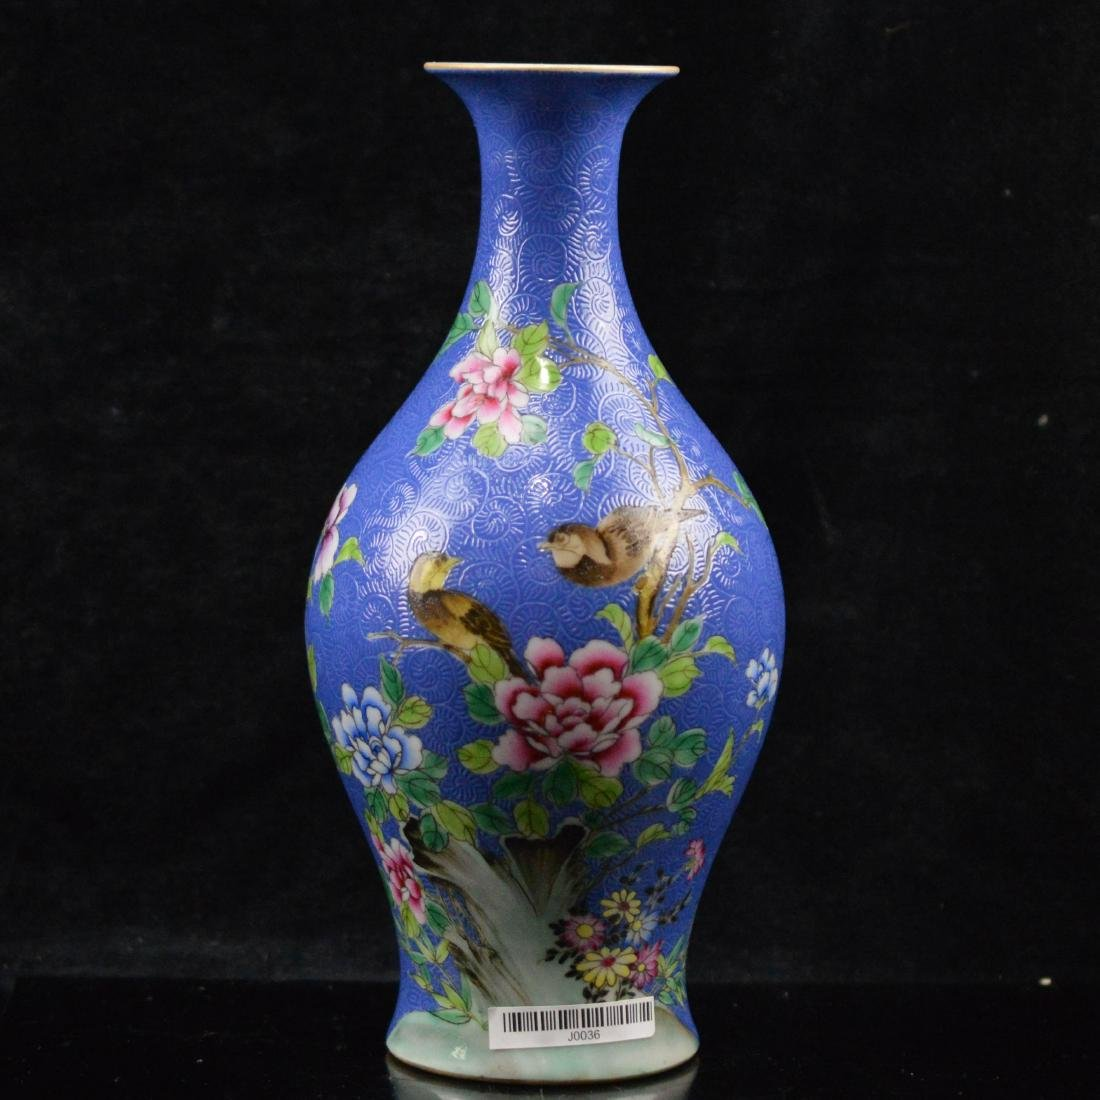 Fen Cai flower birds patterened porcelain vase